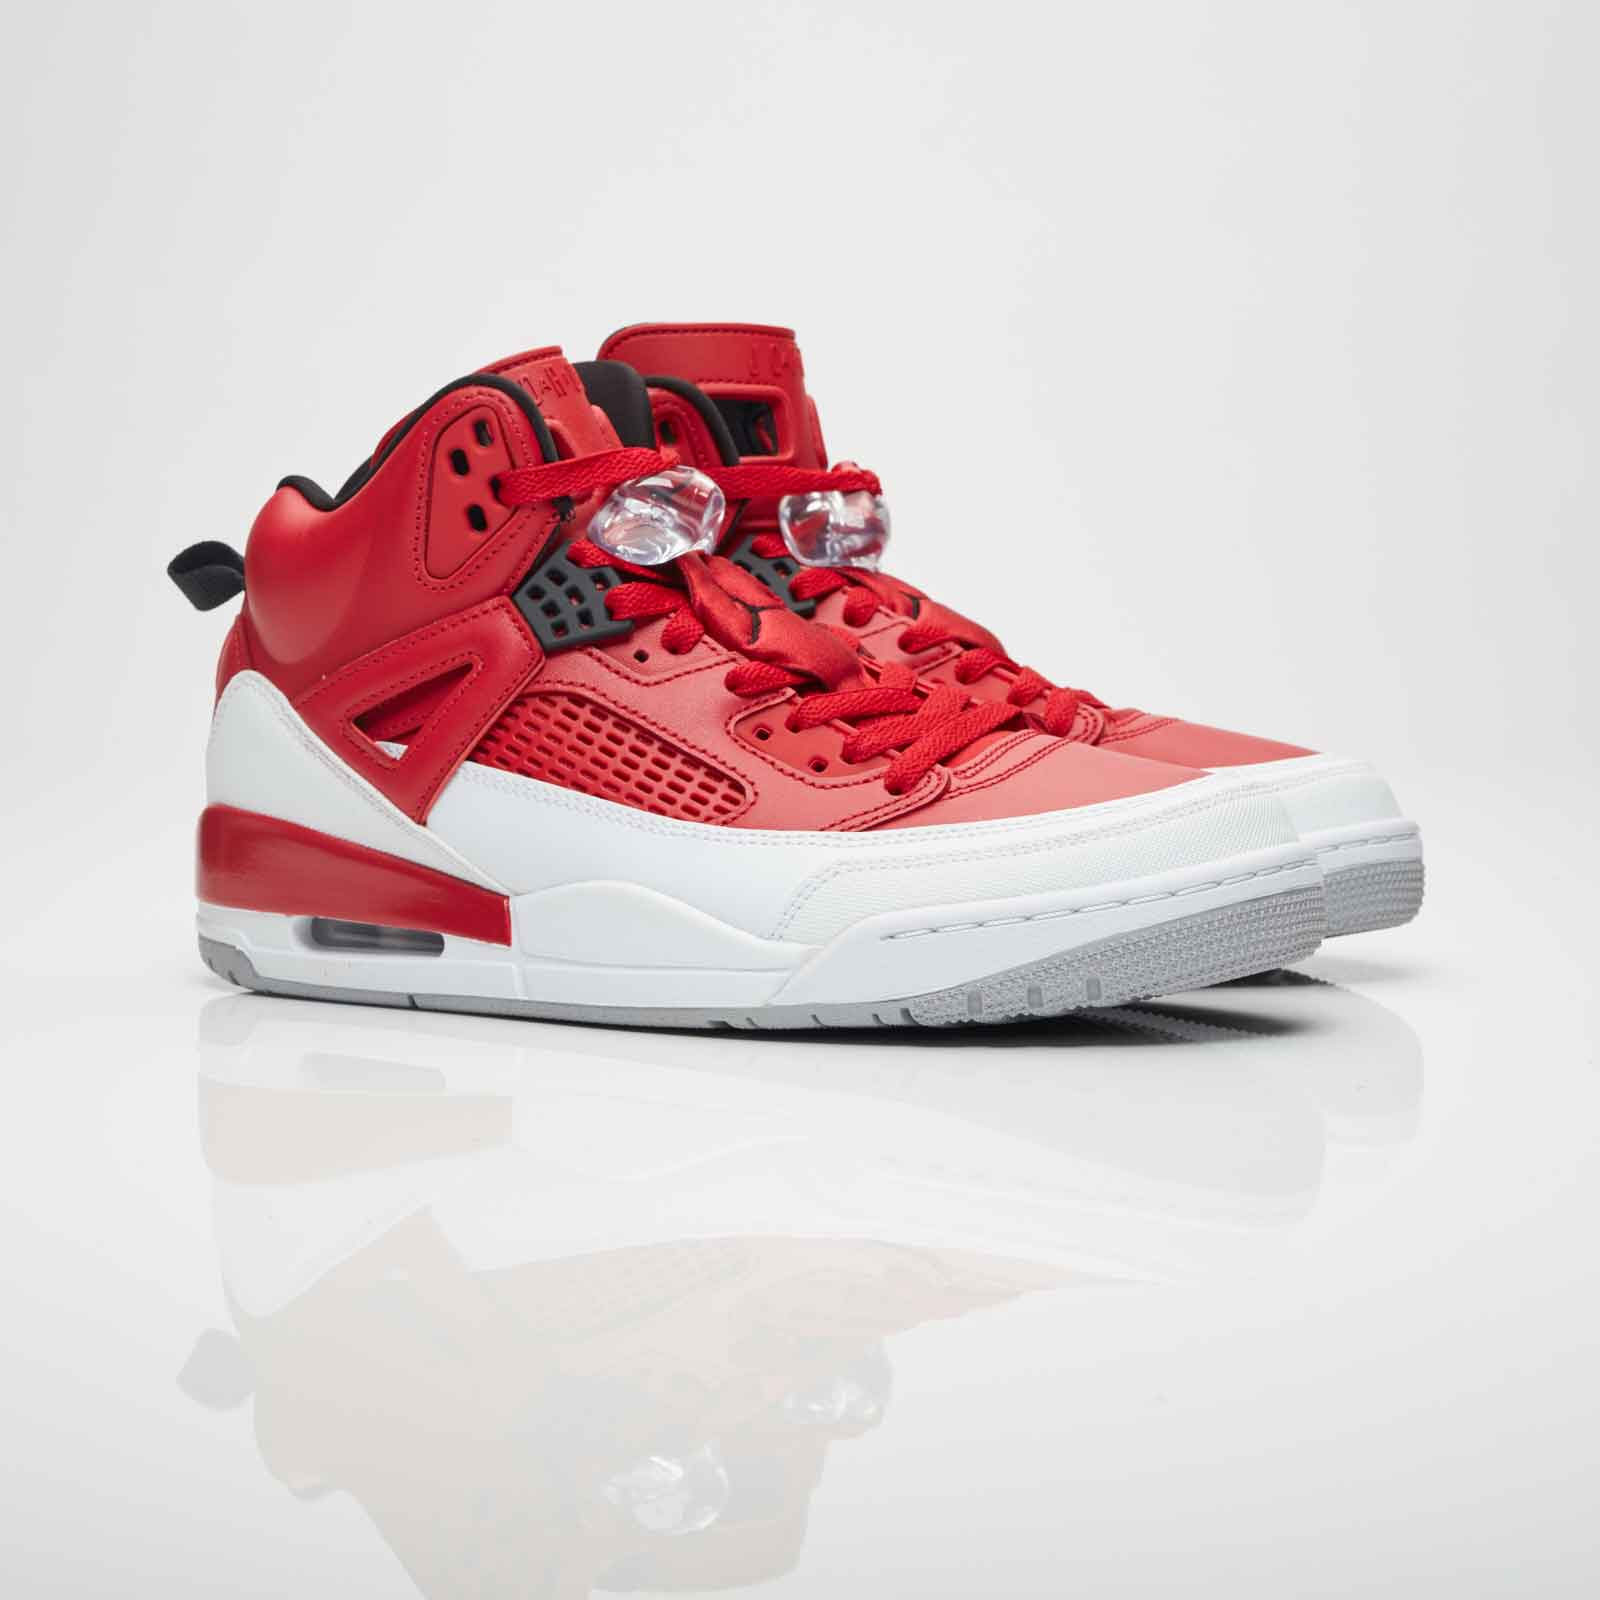 efe0f711aeec45 Jordan Brand Jordan Spizike - 315371-603 - Sneakersnstuff